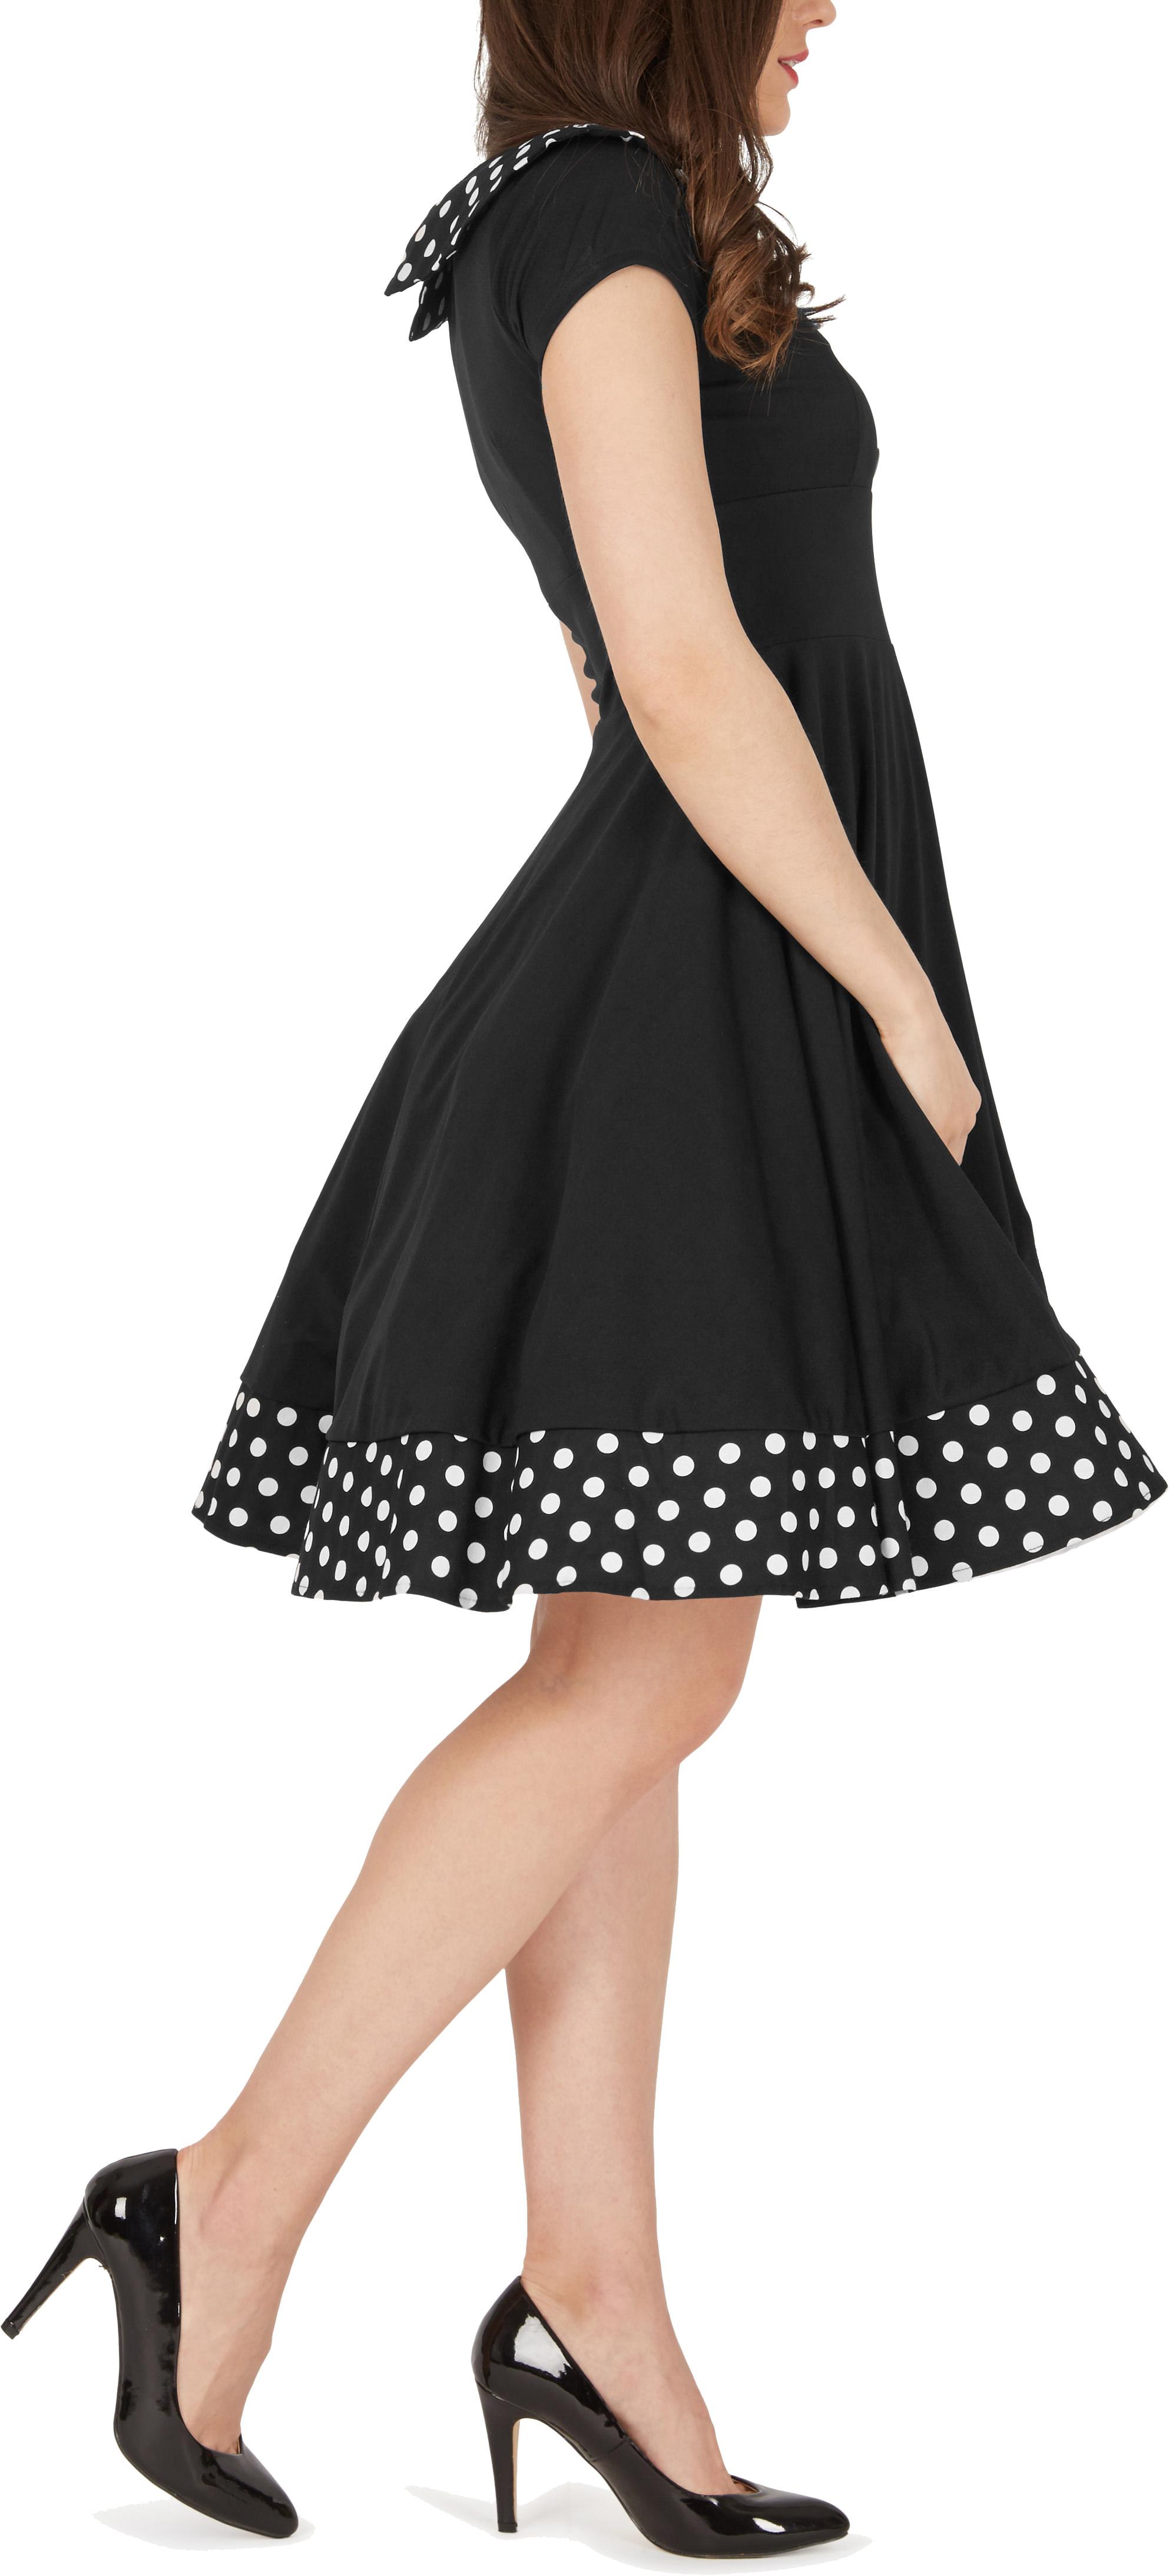 039-Rhianna-039-Vintage-Polka-Dot-Pin-Up-1950-039-s-Rockabilly-Swing-Prom-Dress miniatuur 3